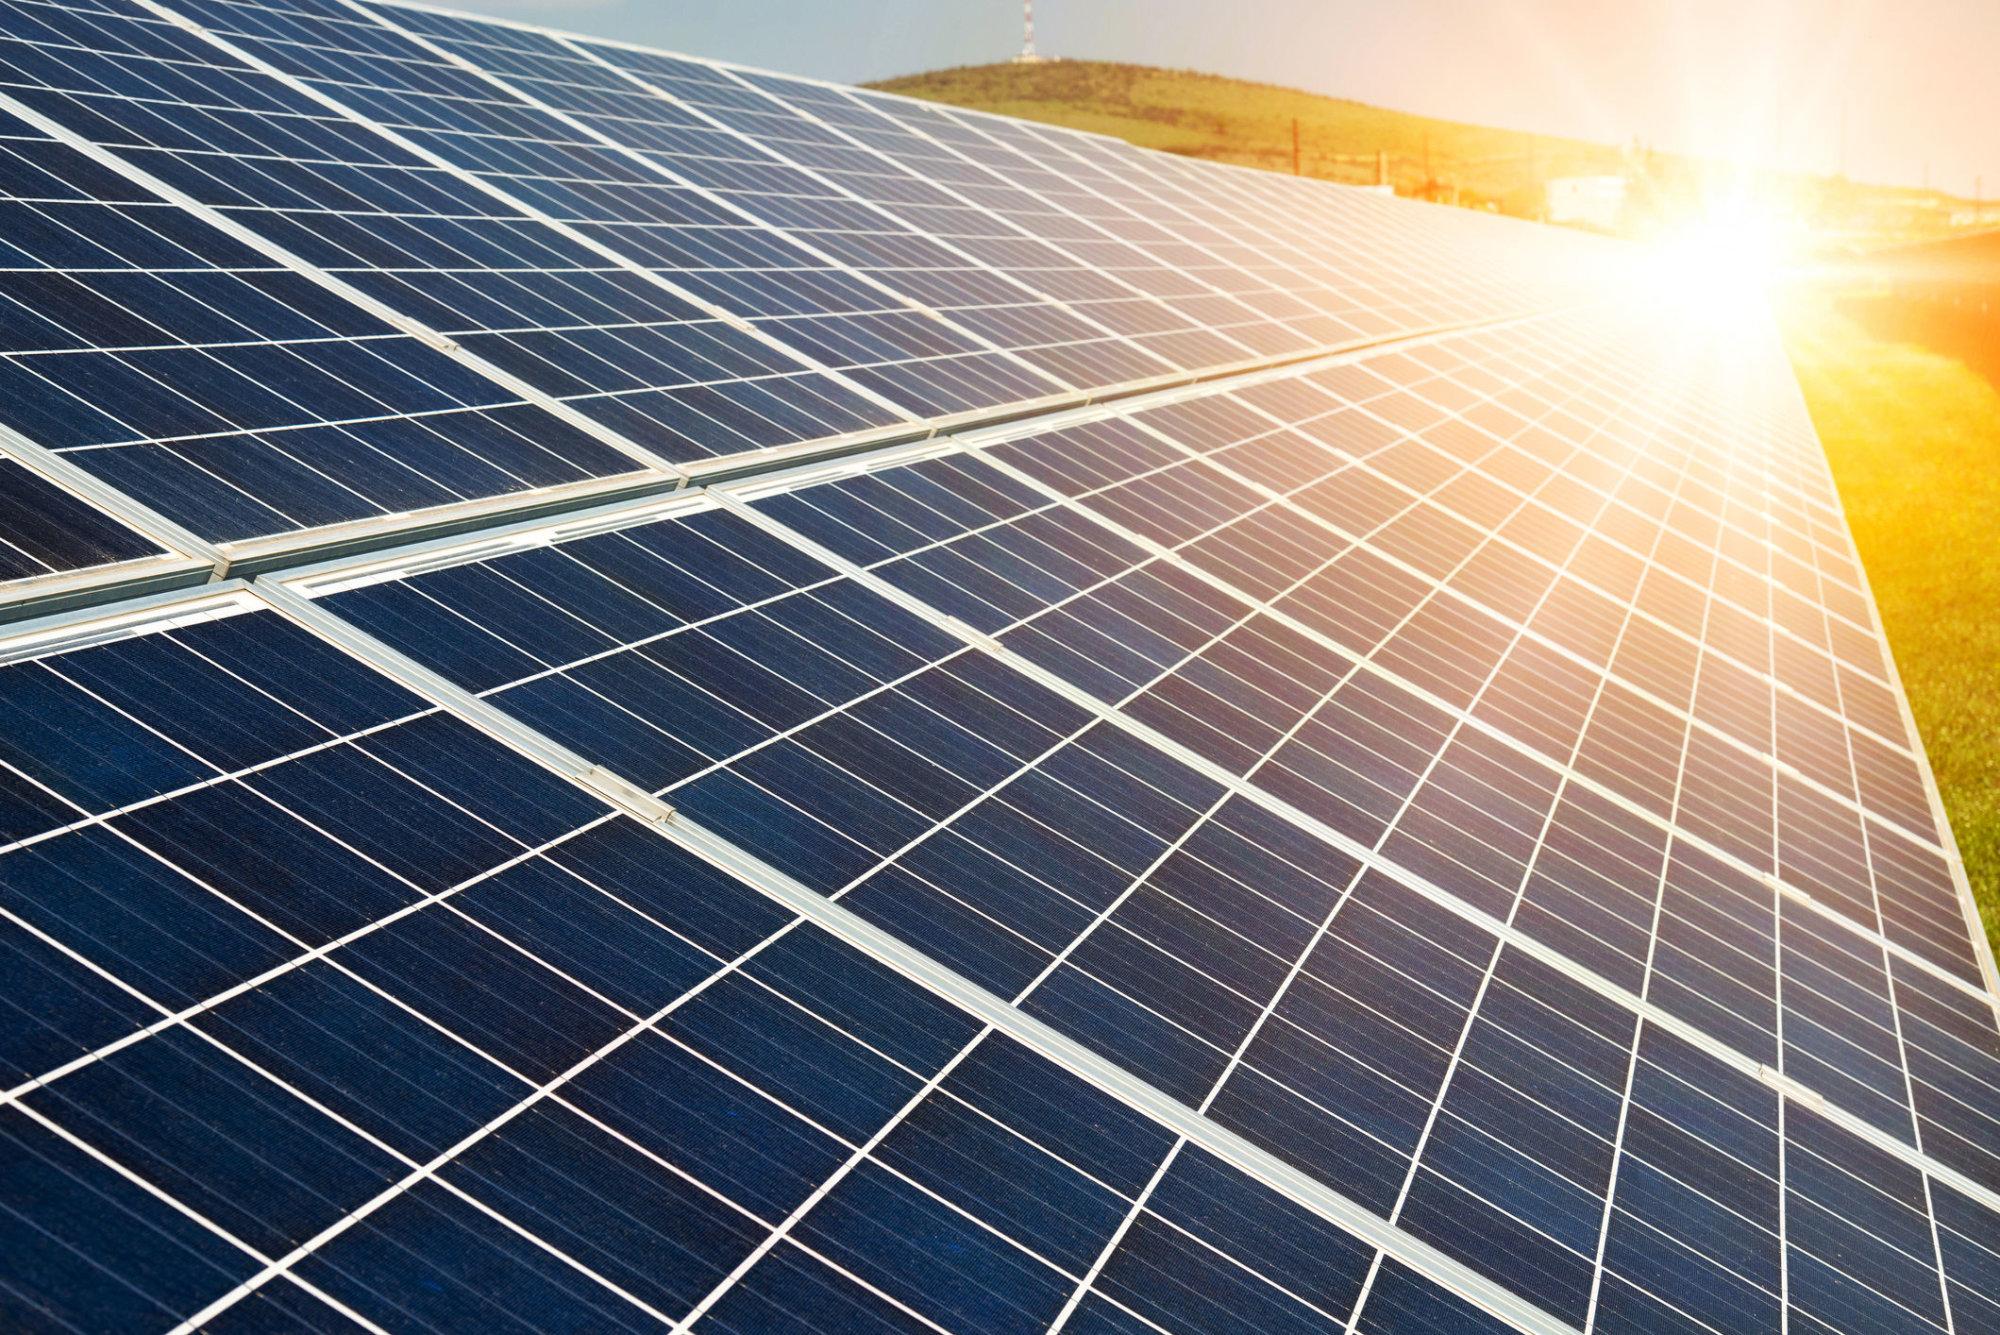 Virginia lawmakers pass major renewable energy legislation